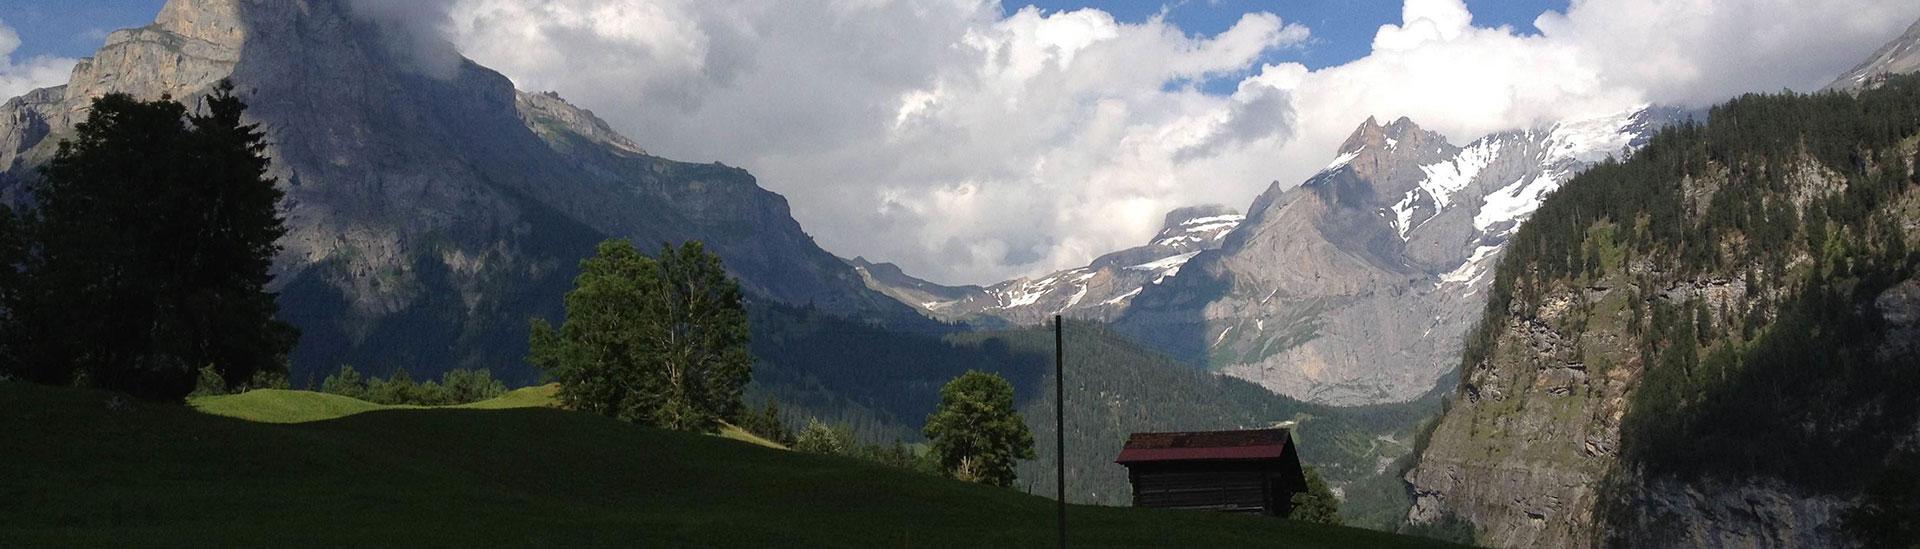 mountain-hillside-banner